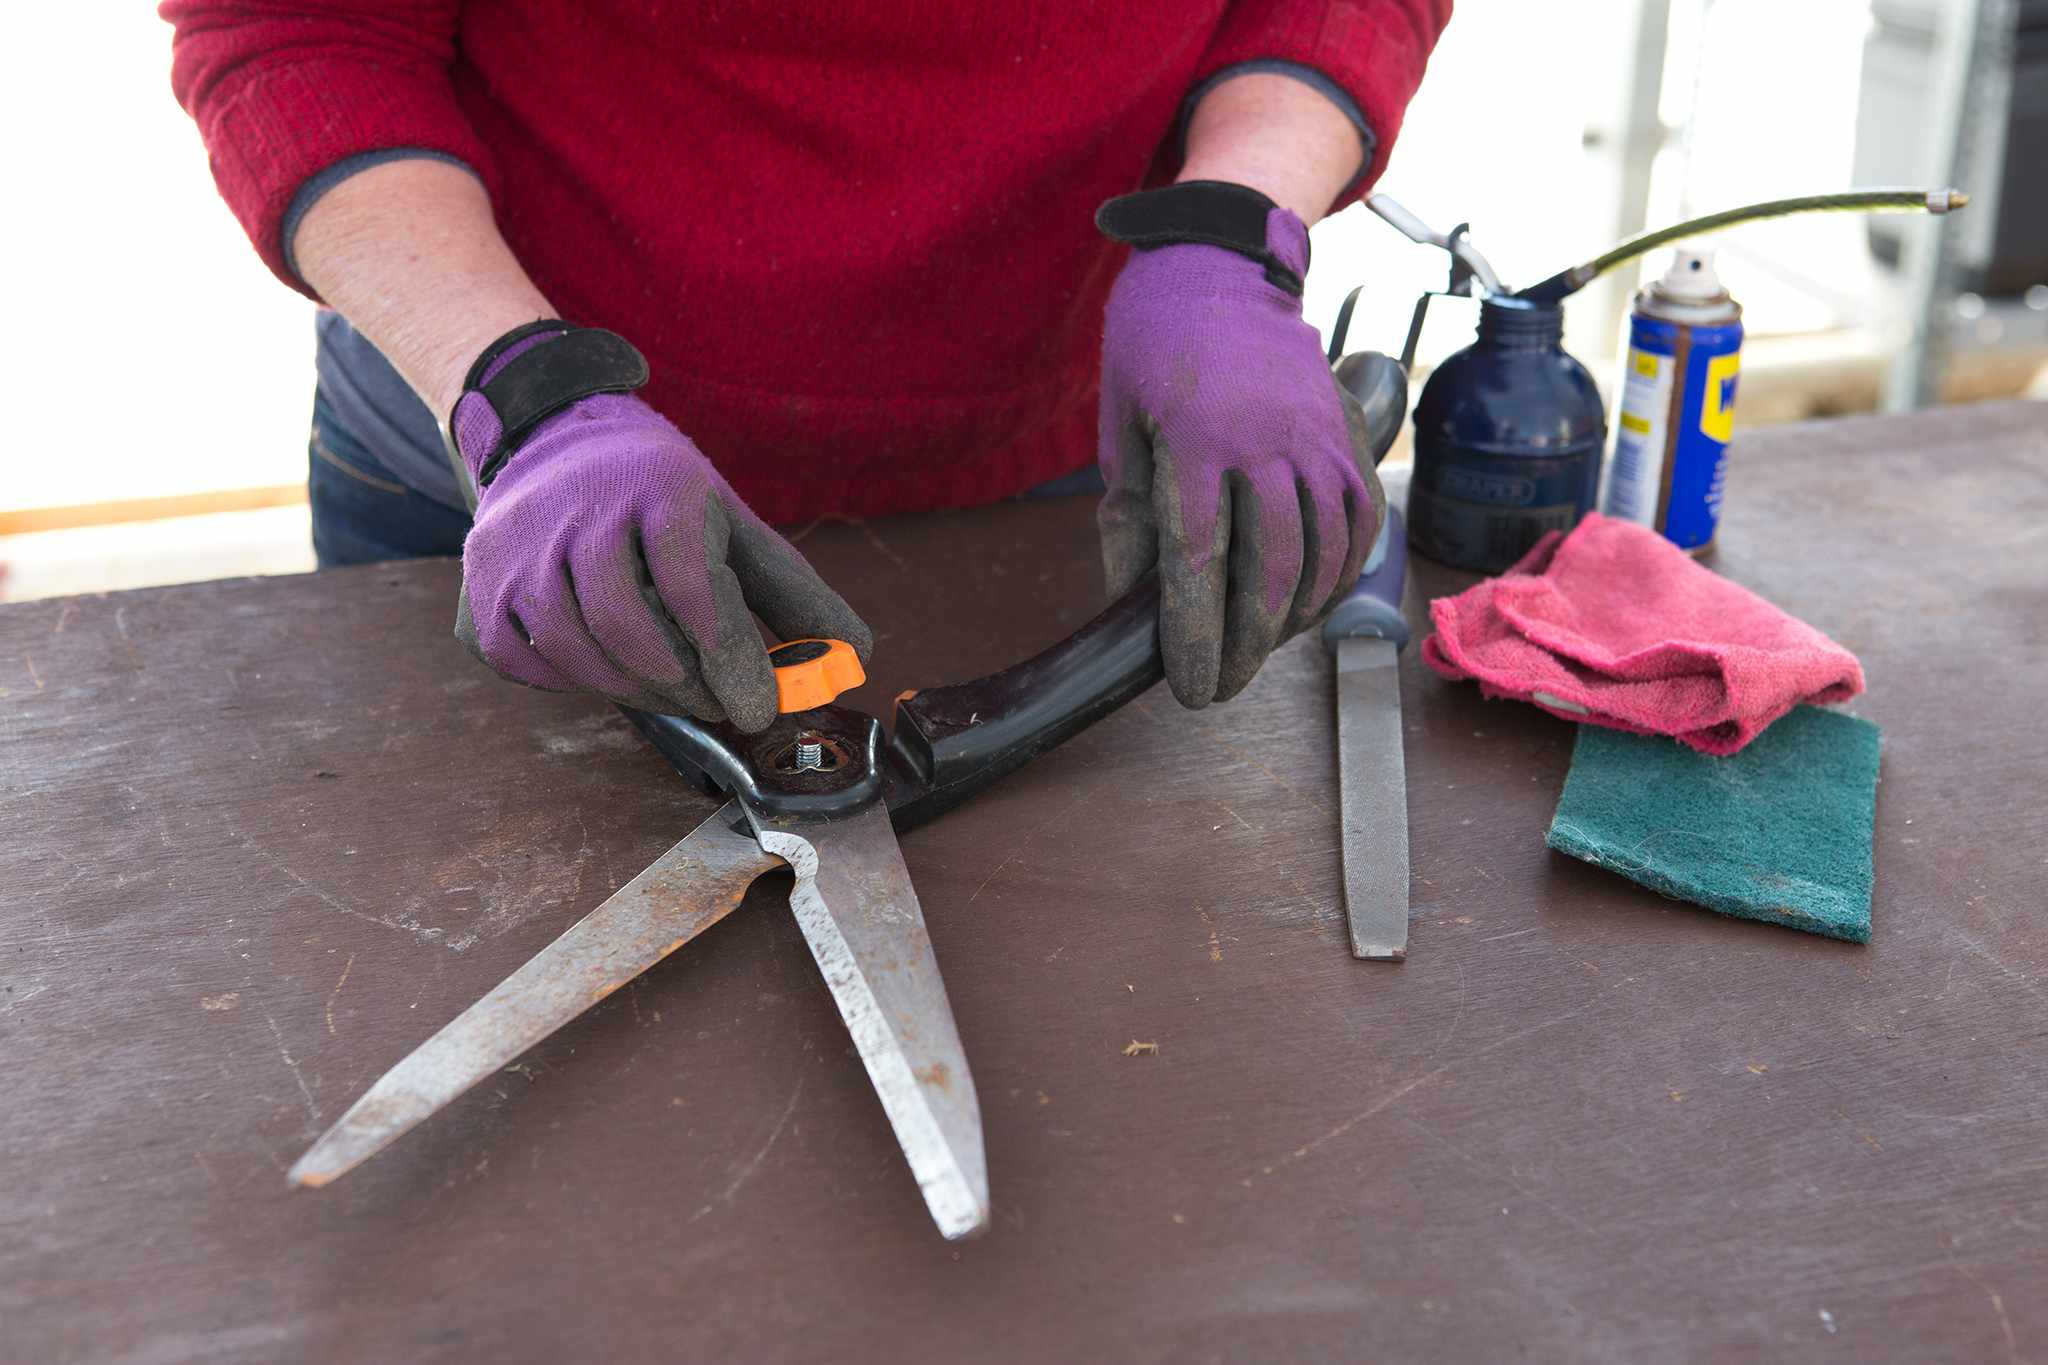 Maintaining shears